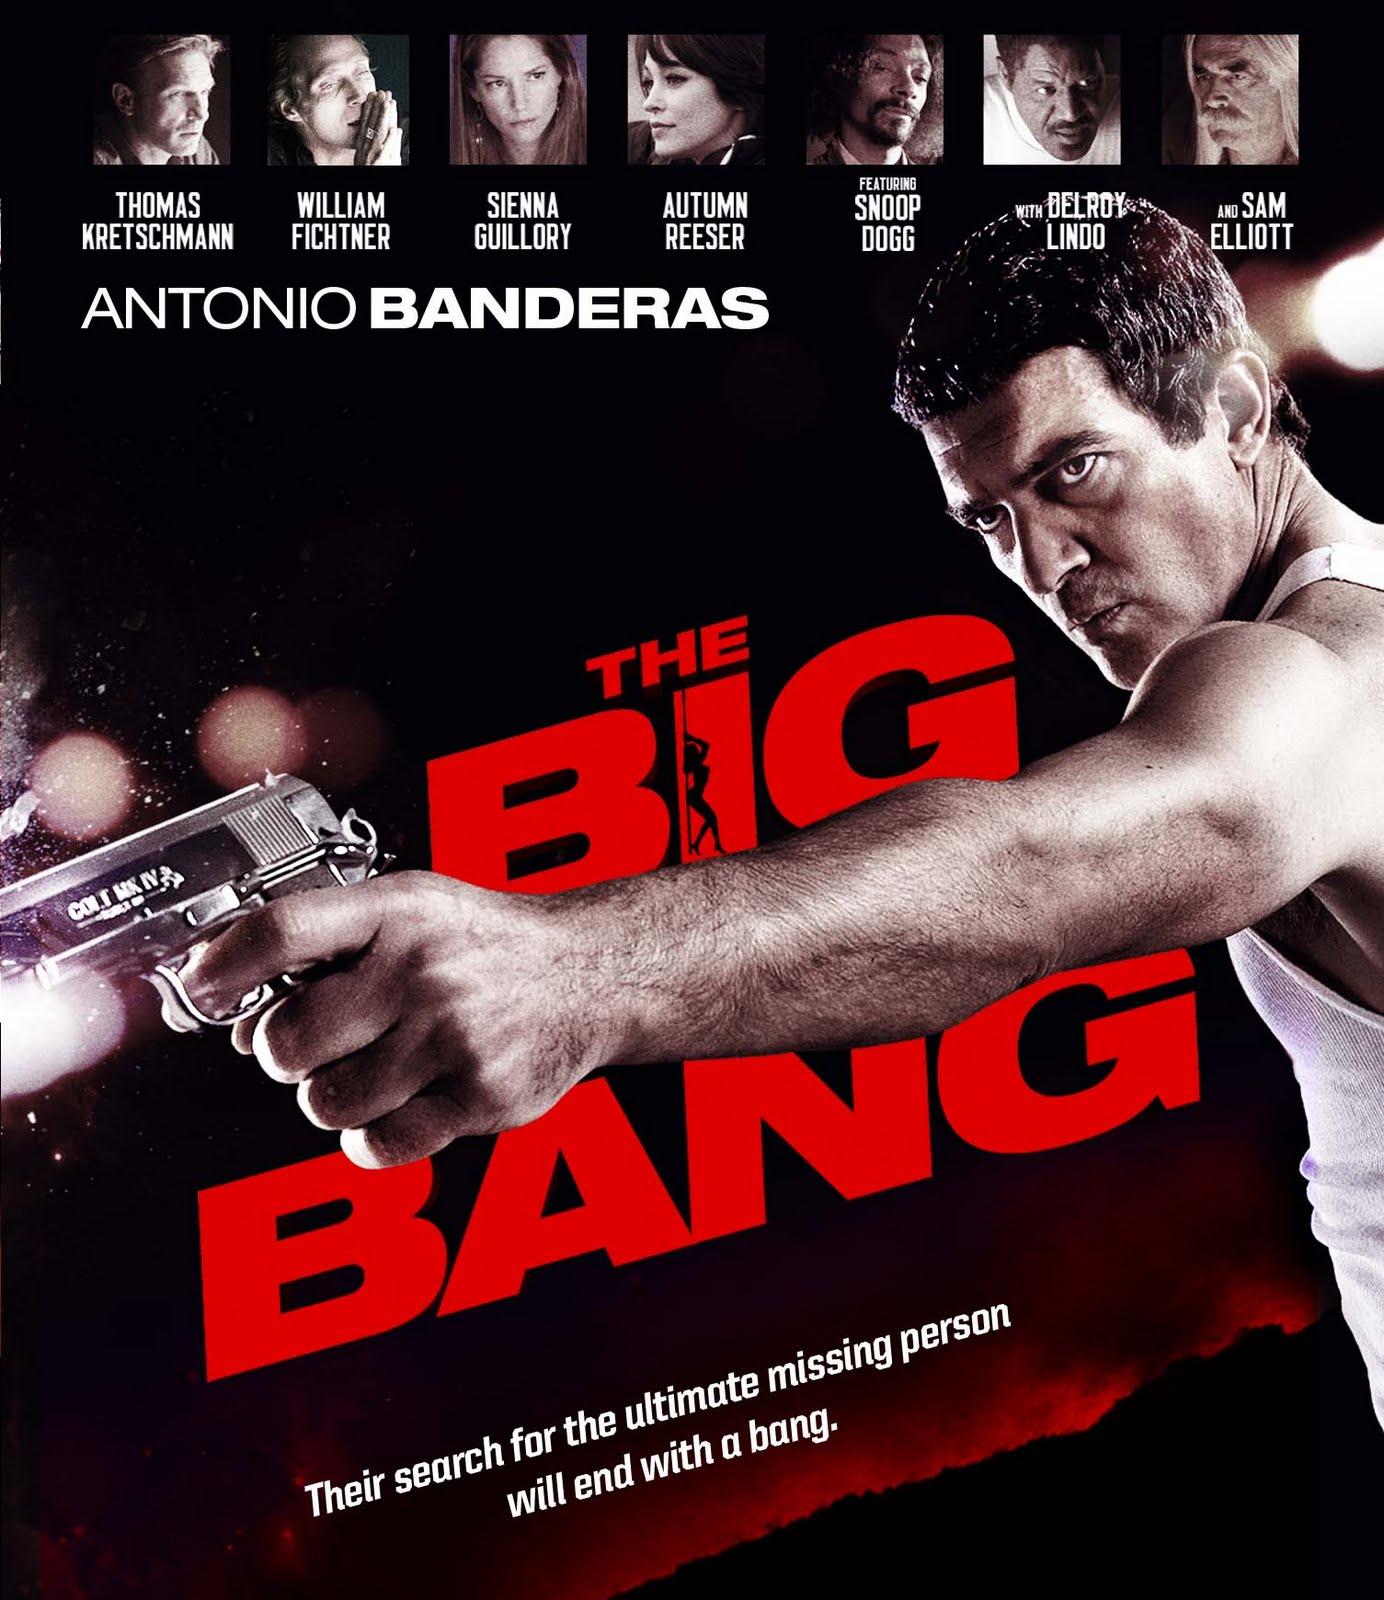 http://4.bp.blogspot.com/-kYgxWeDwaco/TbdEJBWj_lI/AAAAAAAAKOE/EAzdf_HdIjQ/s1600/Big+Bang+BD.jpg